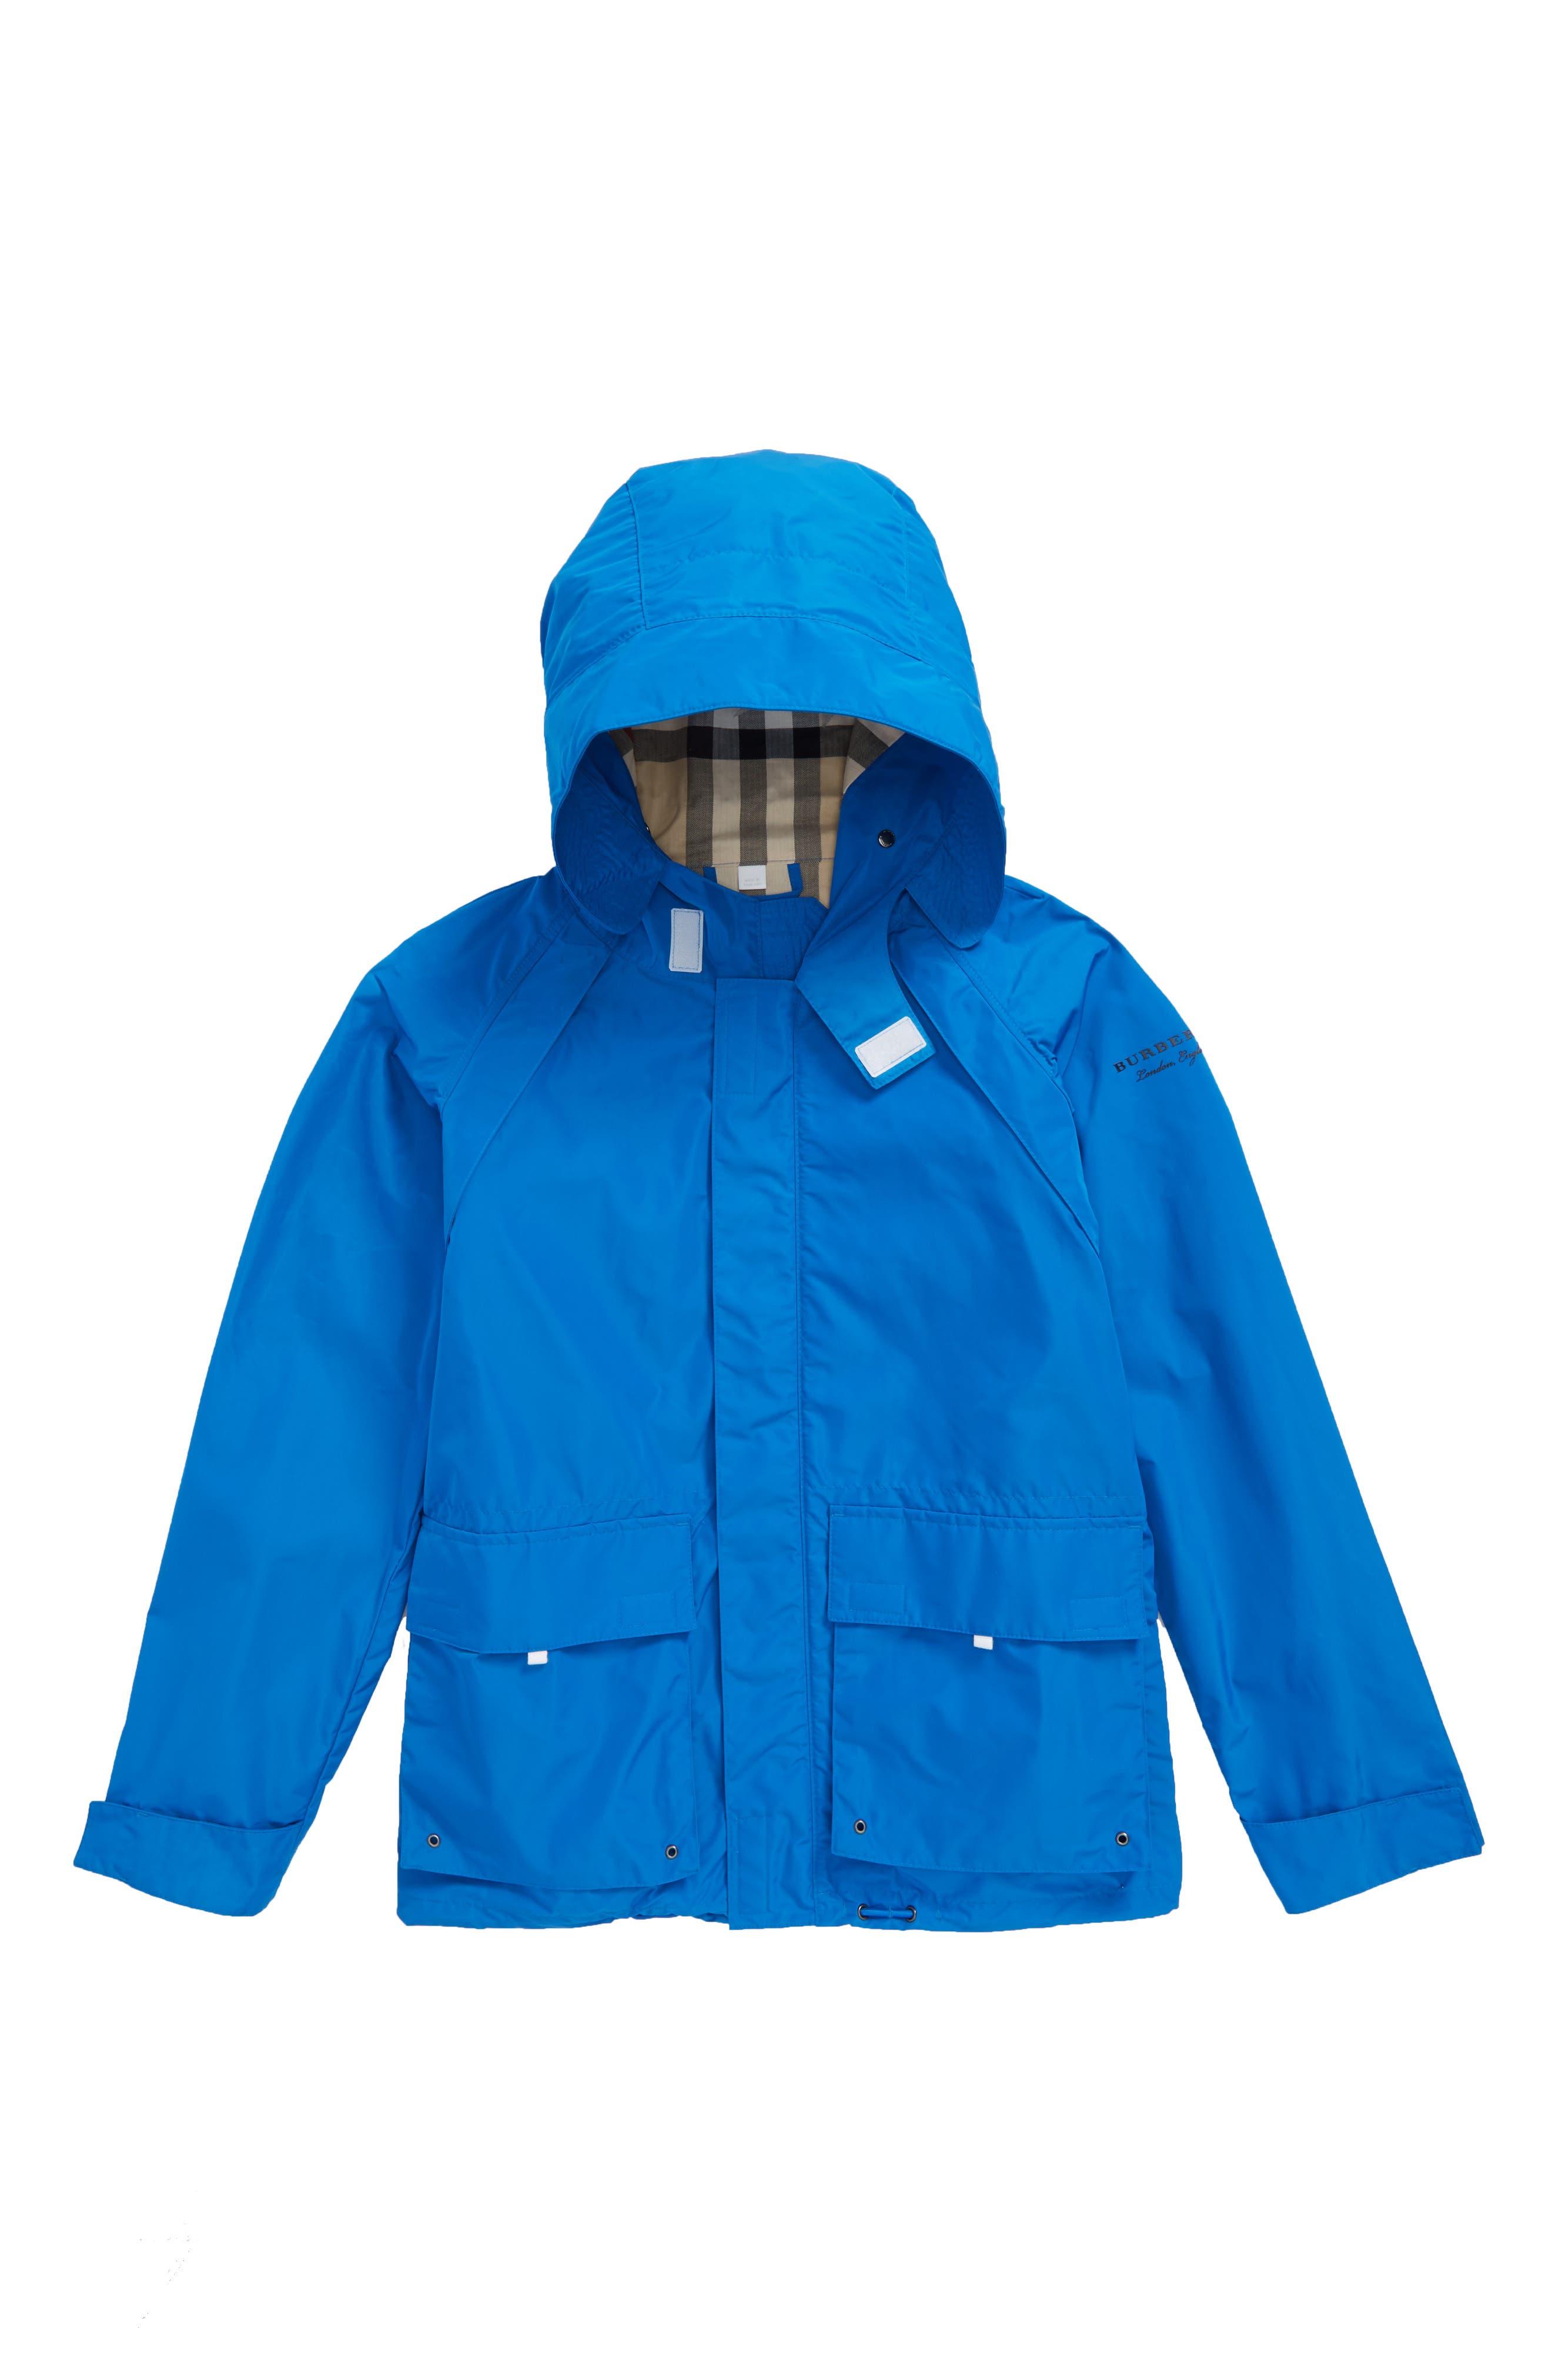 Yately Waterproof Field Jacket,                             Main thumbnail 1, color,                             420